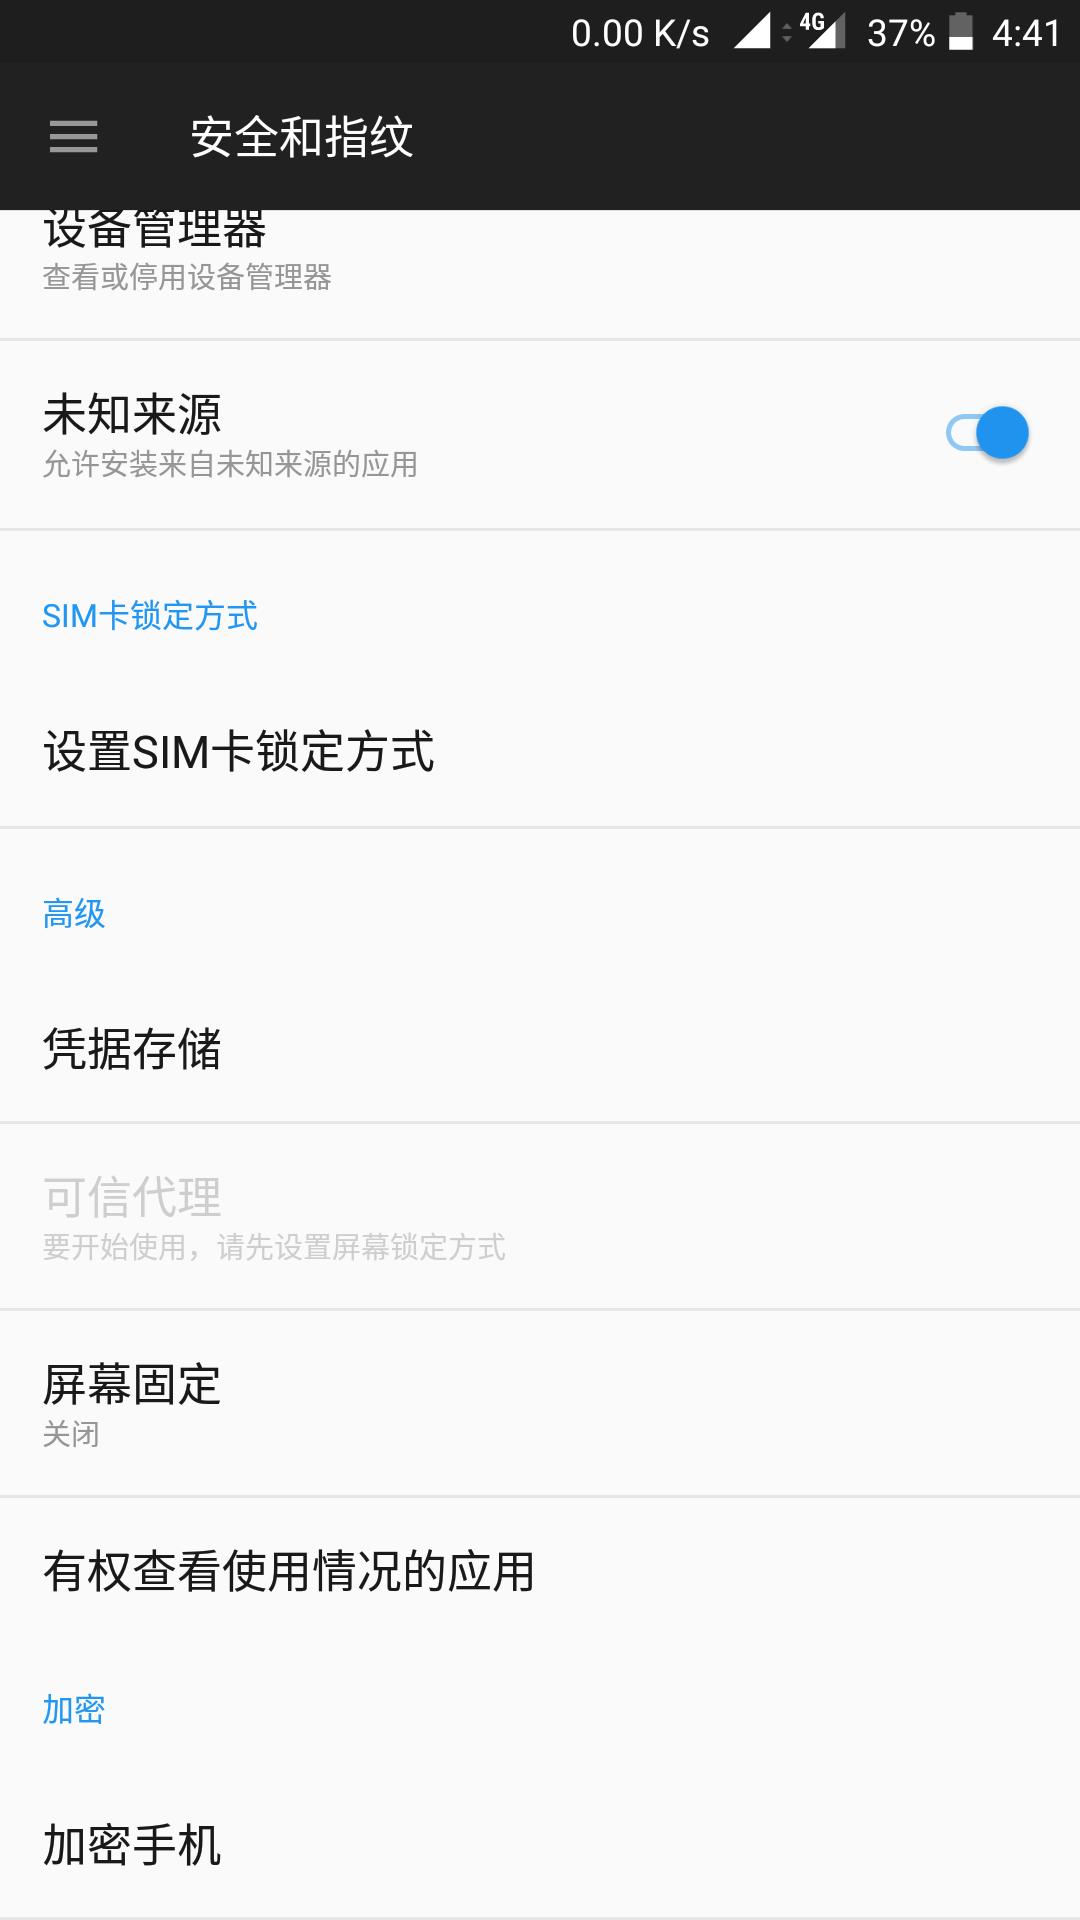 Screenshot_20170604-164123.png